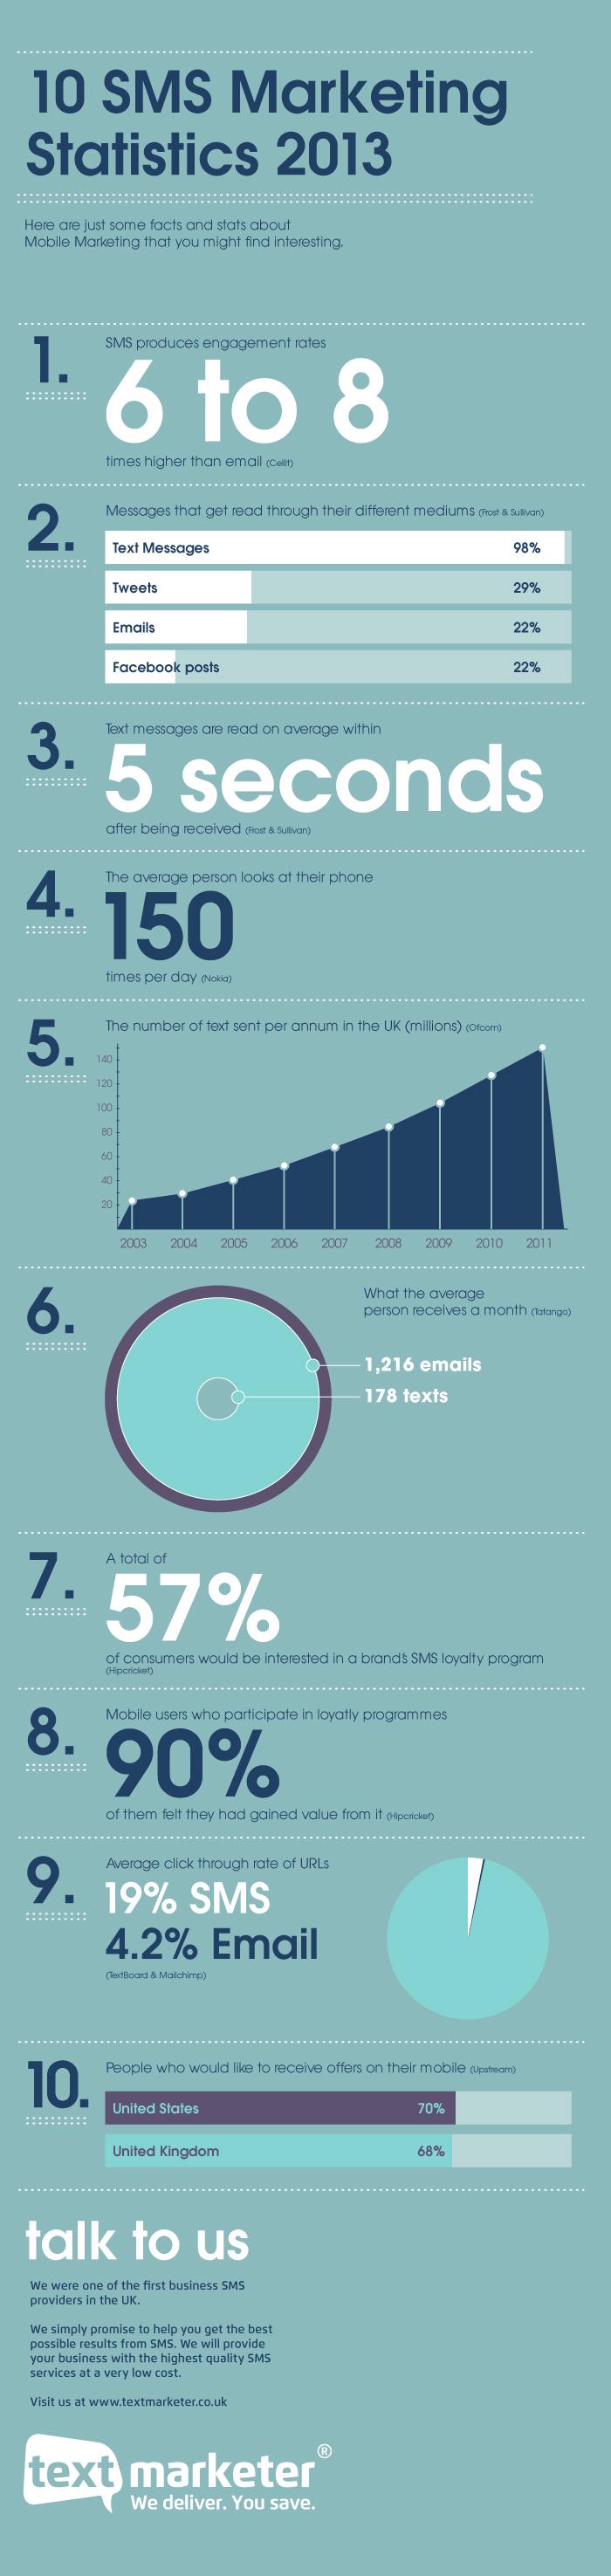 10-mobile-marketing-statistics_5261274b6729b